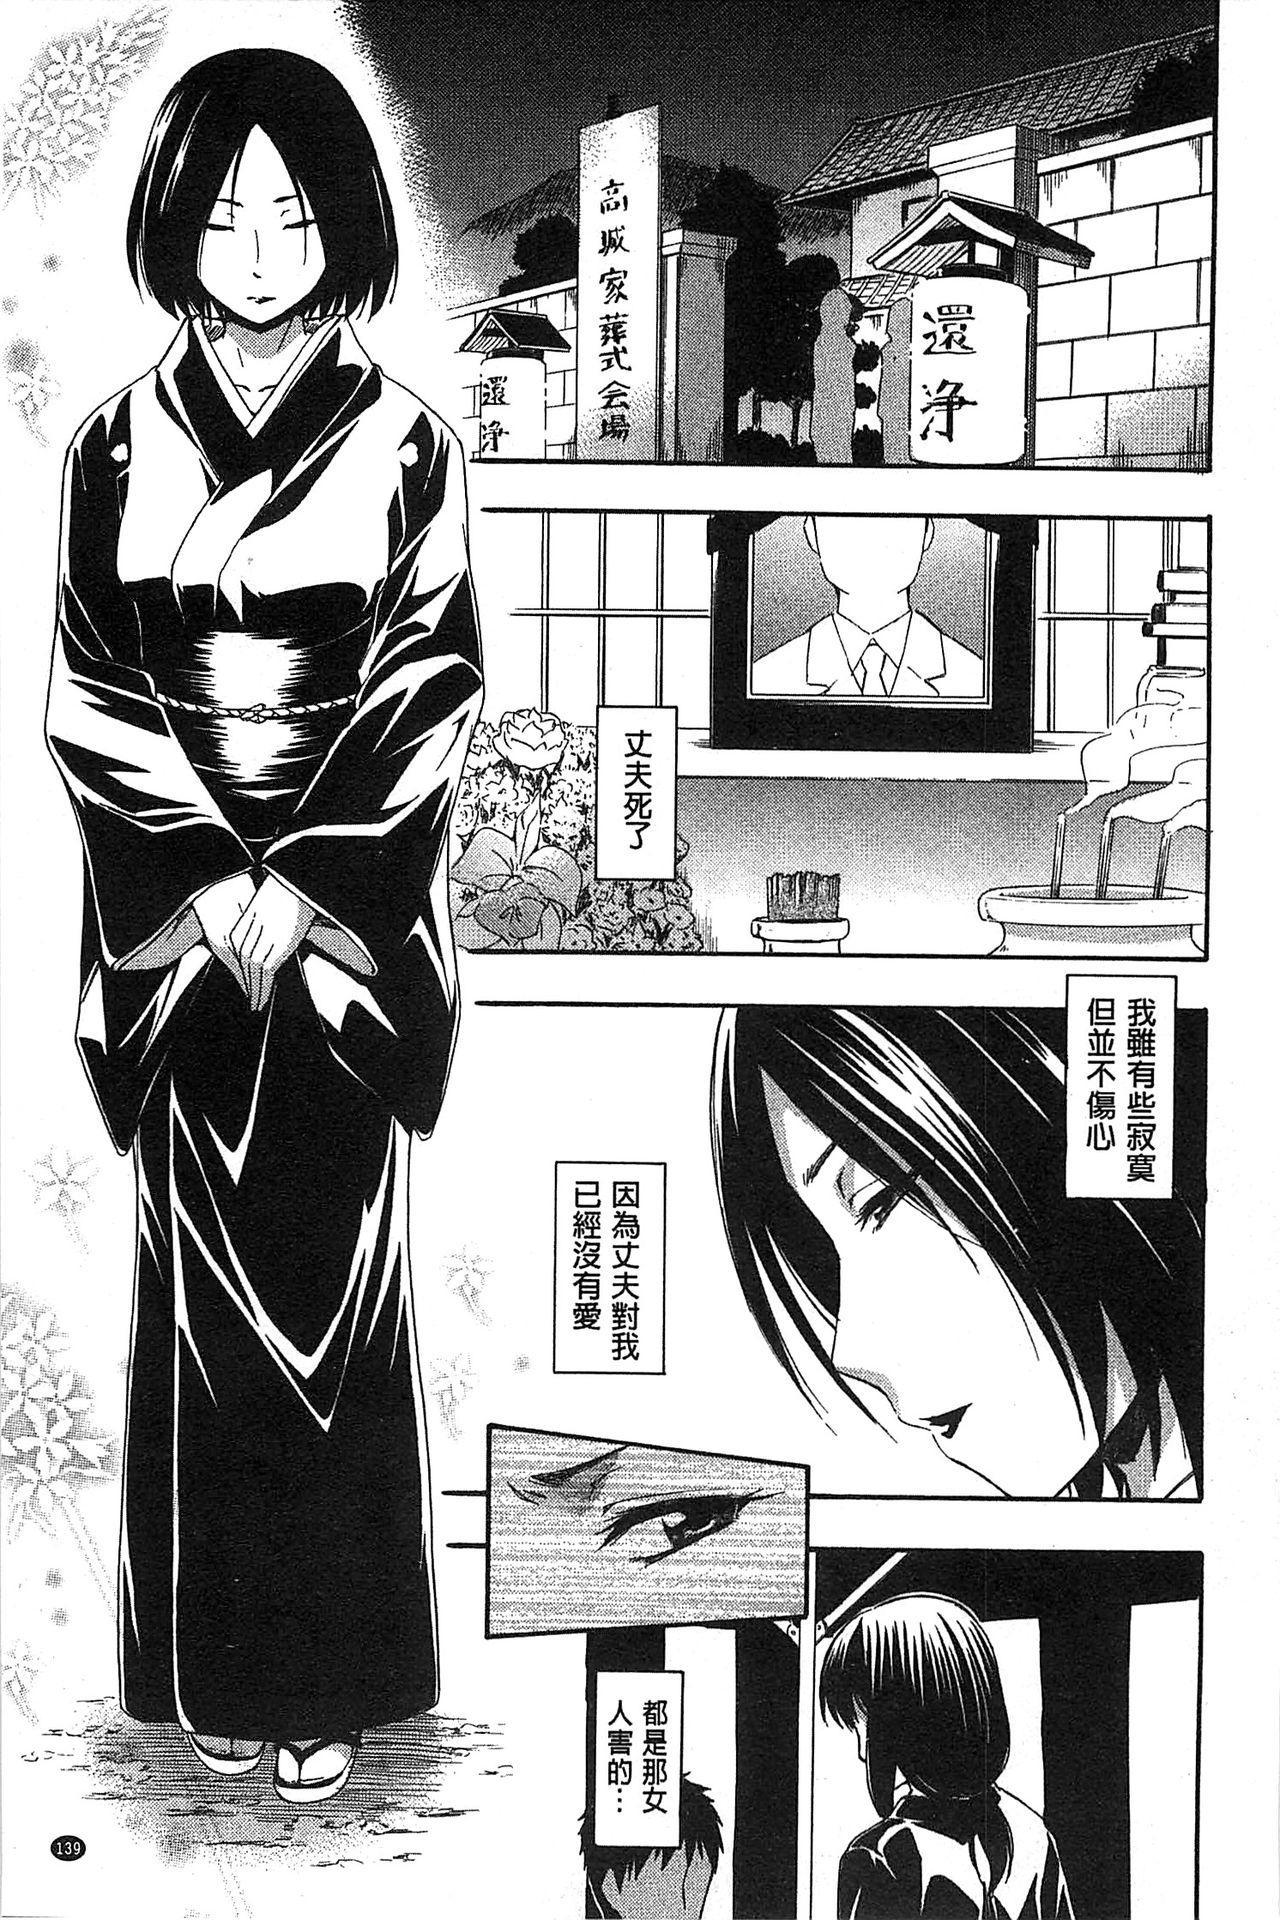 Kokoro Gohoubi | 心靈的褒美 145